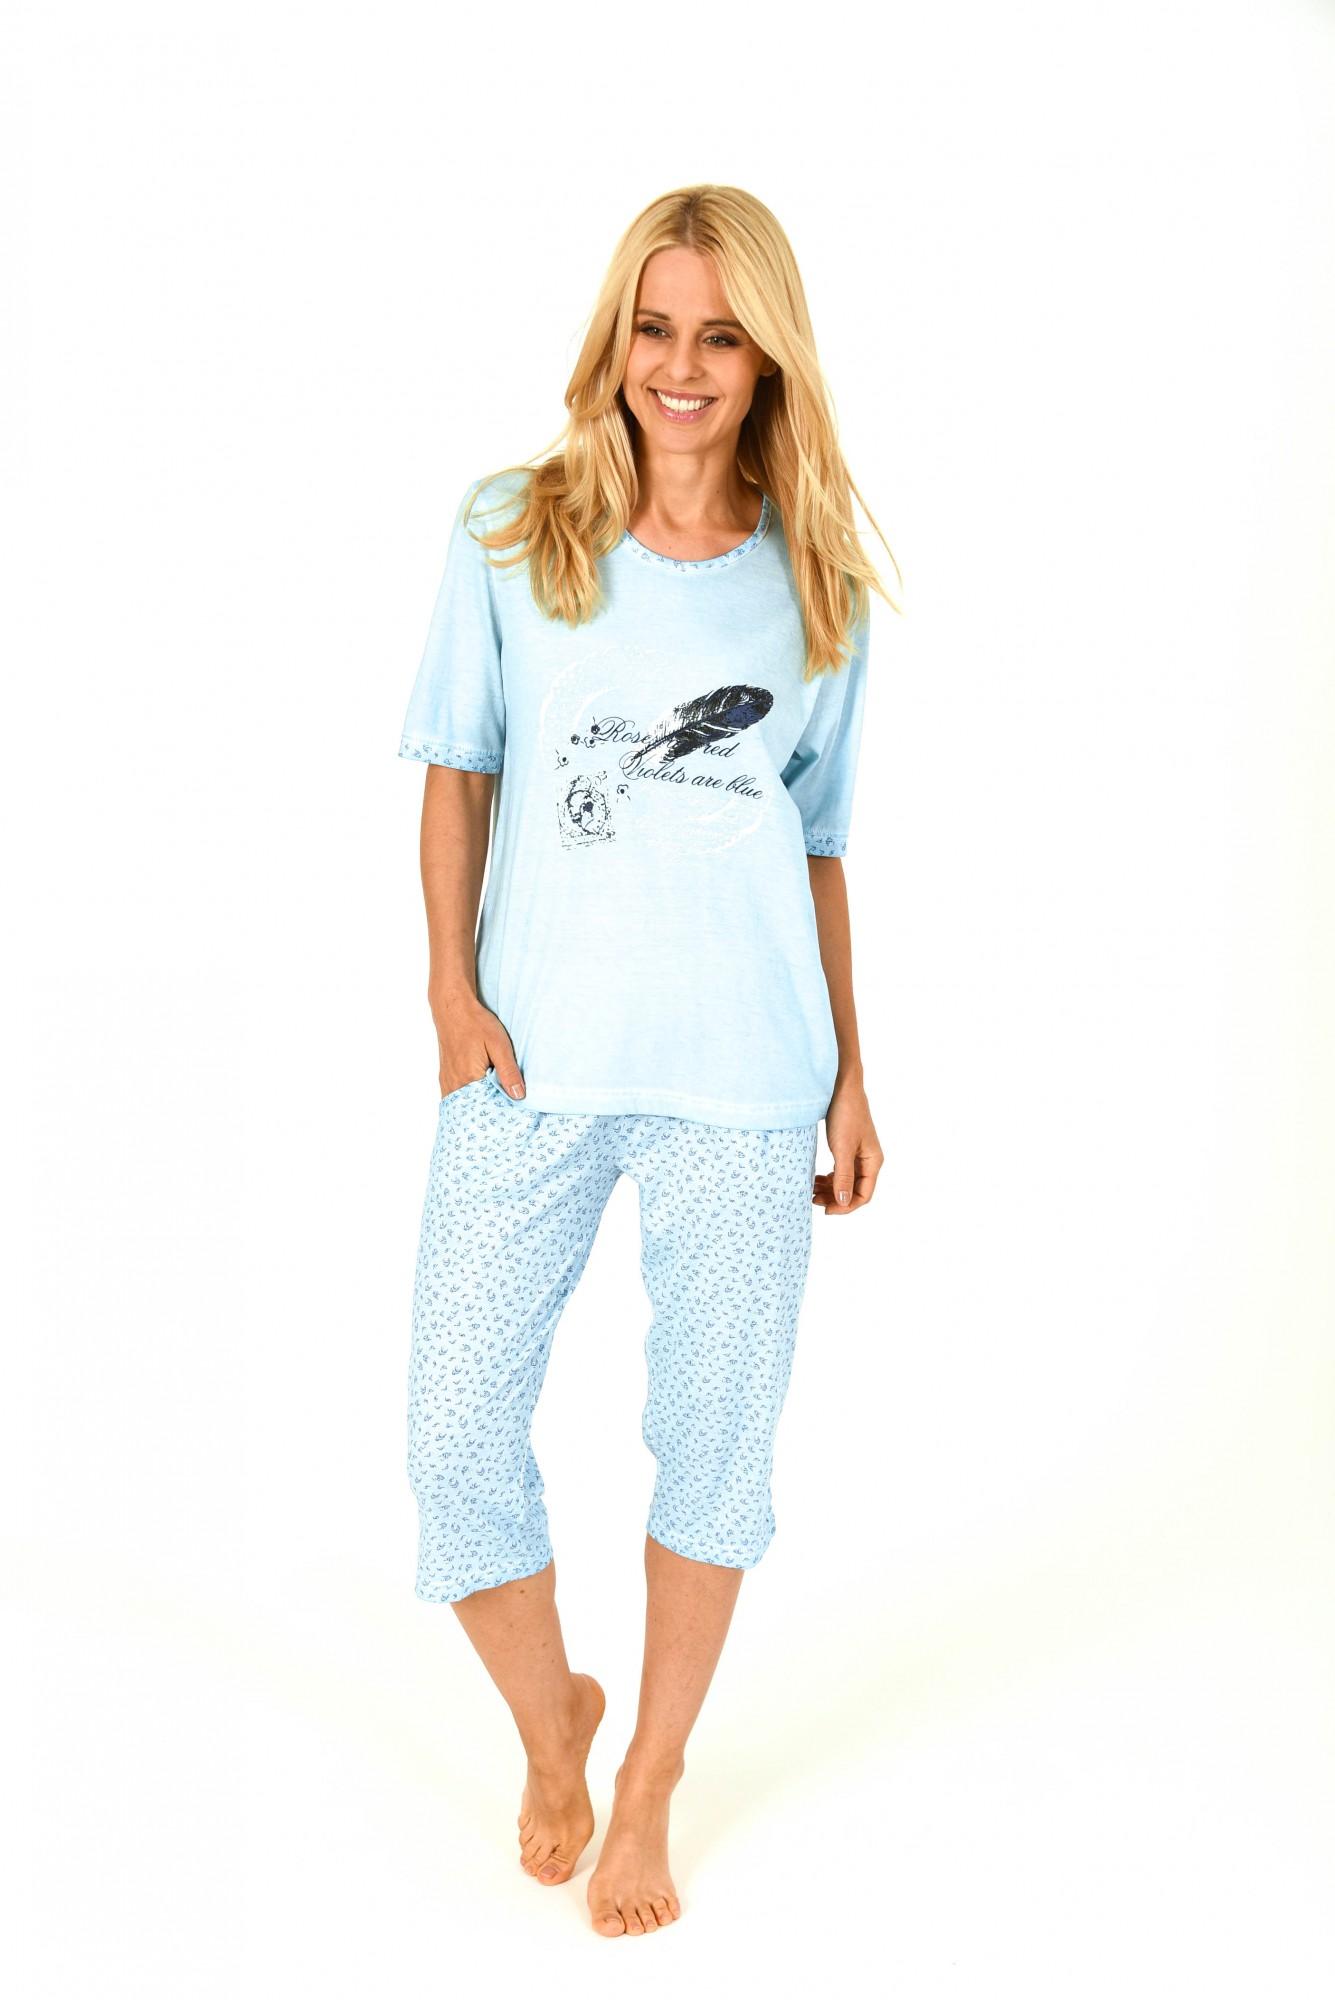 Lässiger Damen Capri Pyjama kurzarm in gewaschener Optik – 171 204 90 820 001